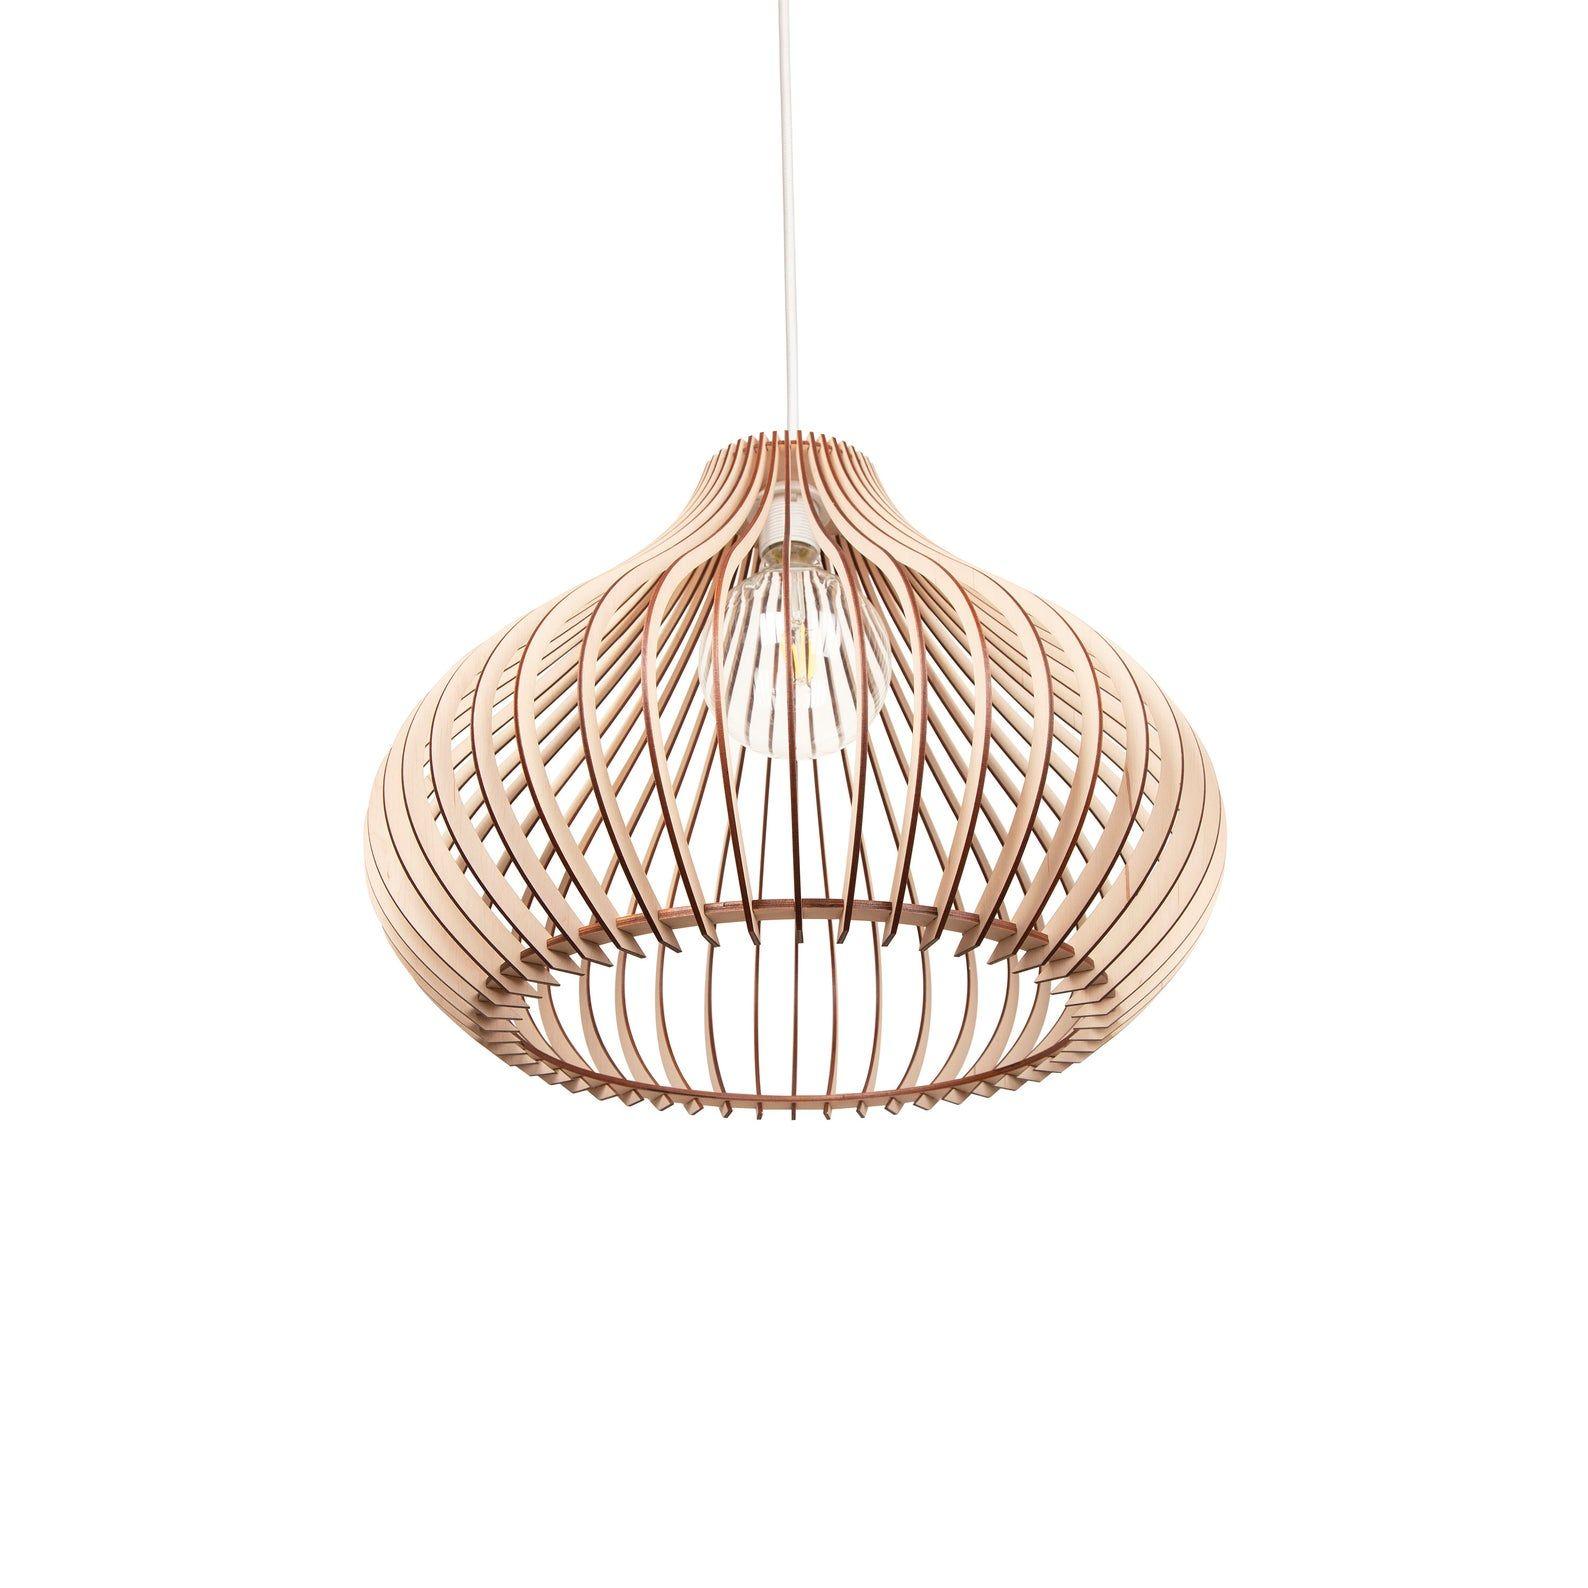 Wood Lamp Wooden Lamp Shade Hanging Lamp Pendant Light Decorative Ceiling Lamp Modern Lamp In 2020 Wooden Lampshade Wood Pendant Light Wooden Pendant Lighting